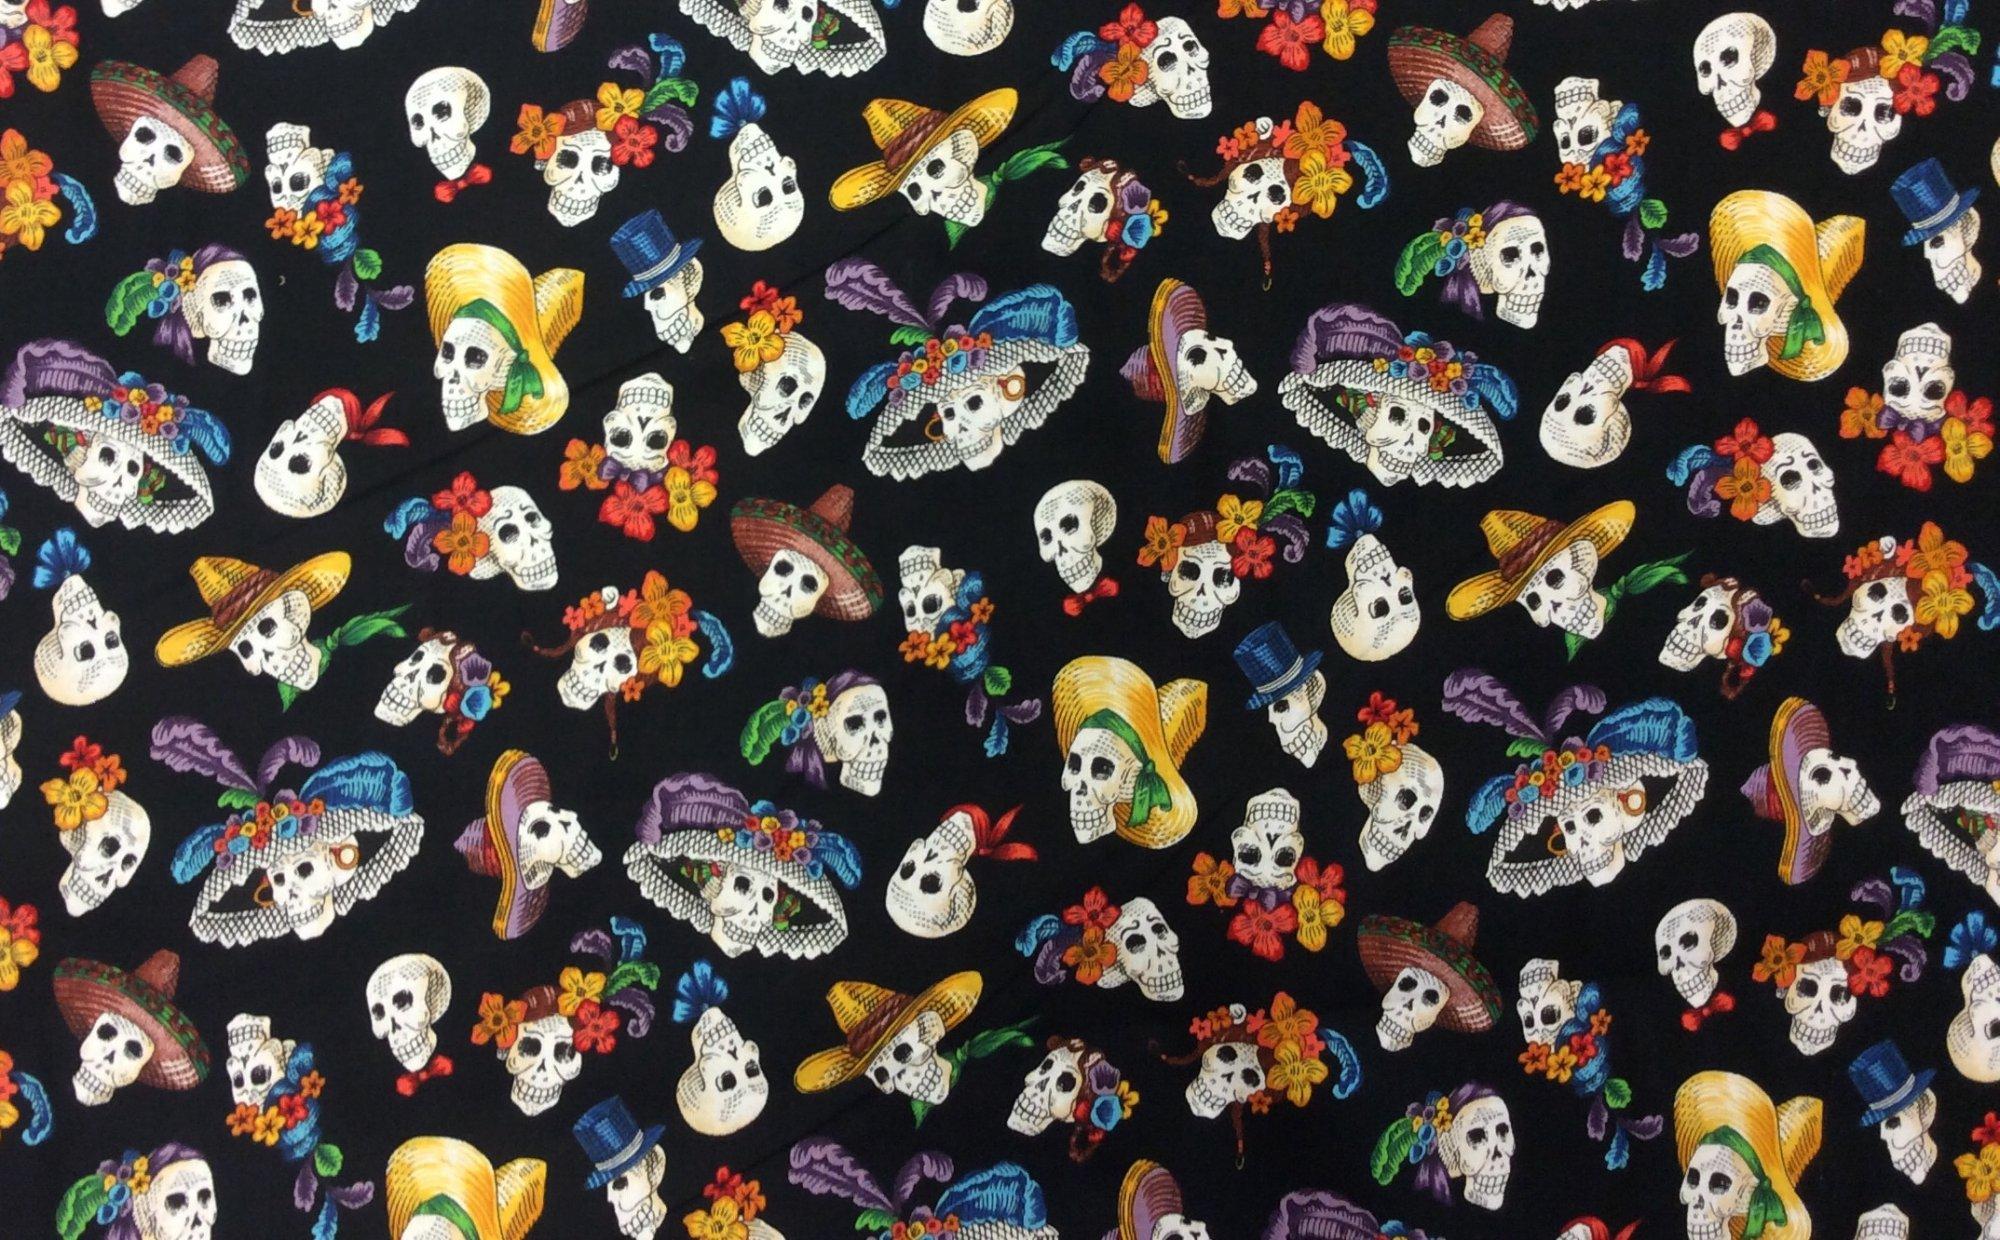 Calaveras Dia de Los Muertos Day of the Dead Mexico Skull Jose Guadalupe Posada Cotton fabric Quilt fabric AH297